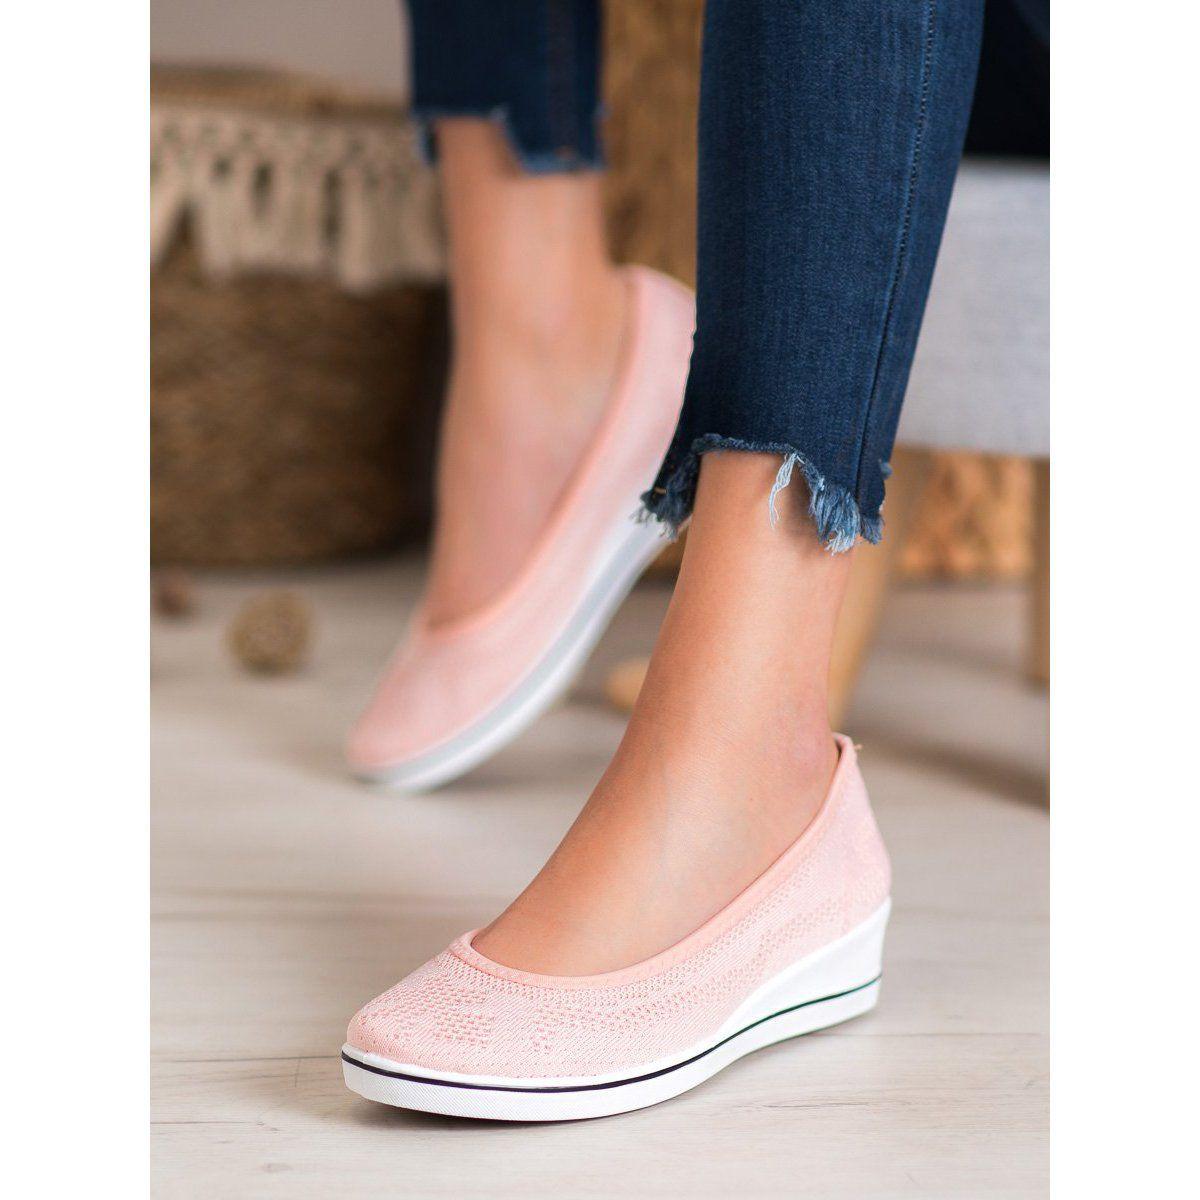 Super Me Azurowe Baleriny Na Koturnie Rozowe In 2020 Slip On Sneaker Shoes Slip On